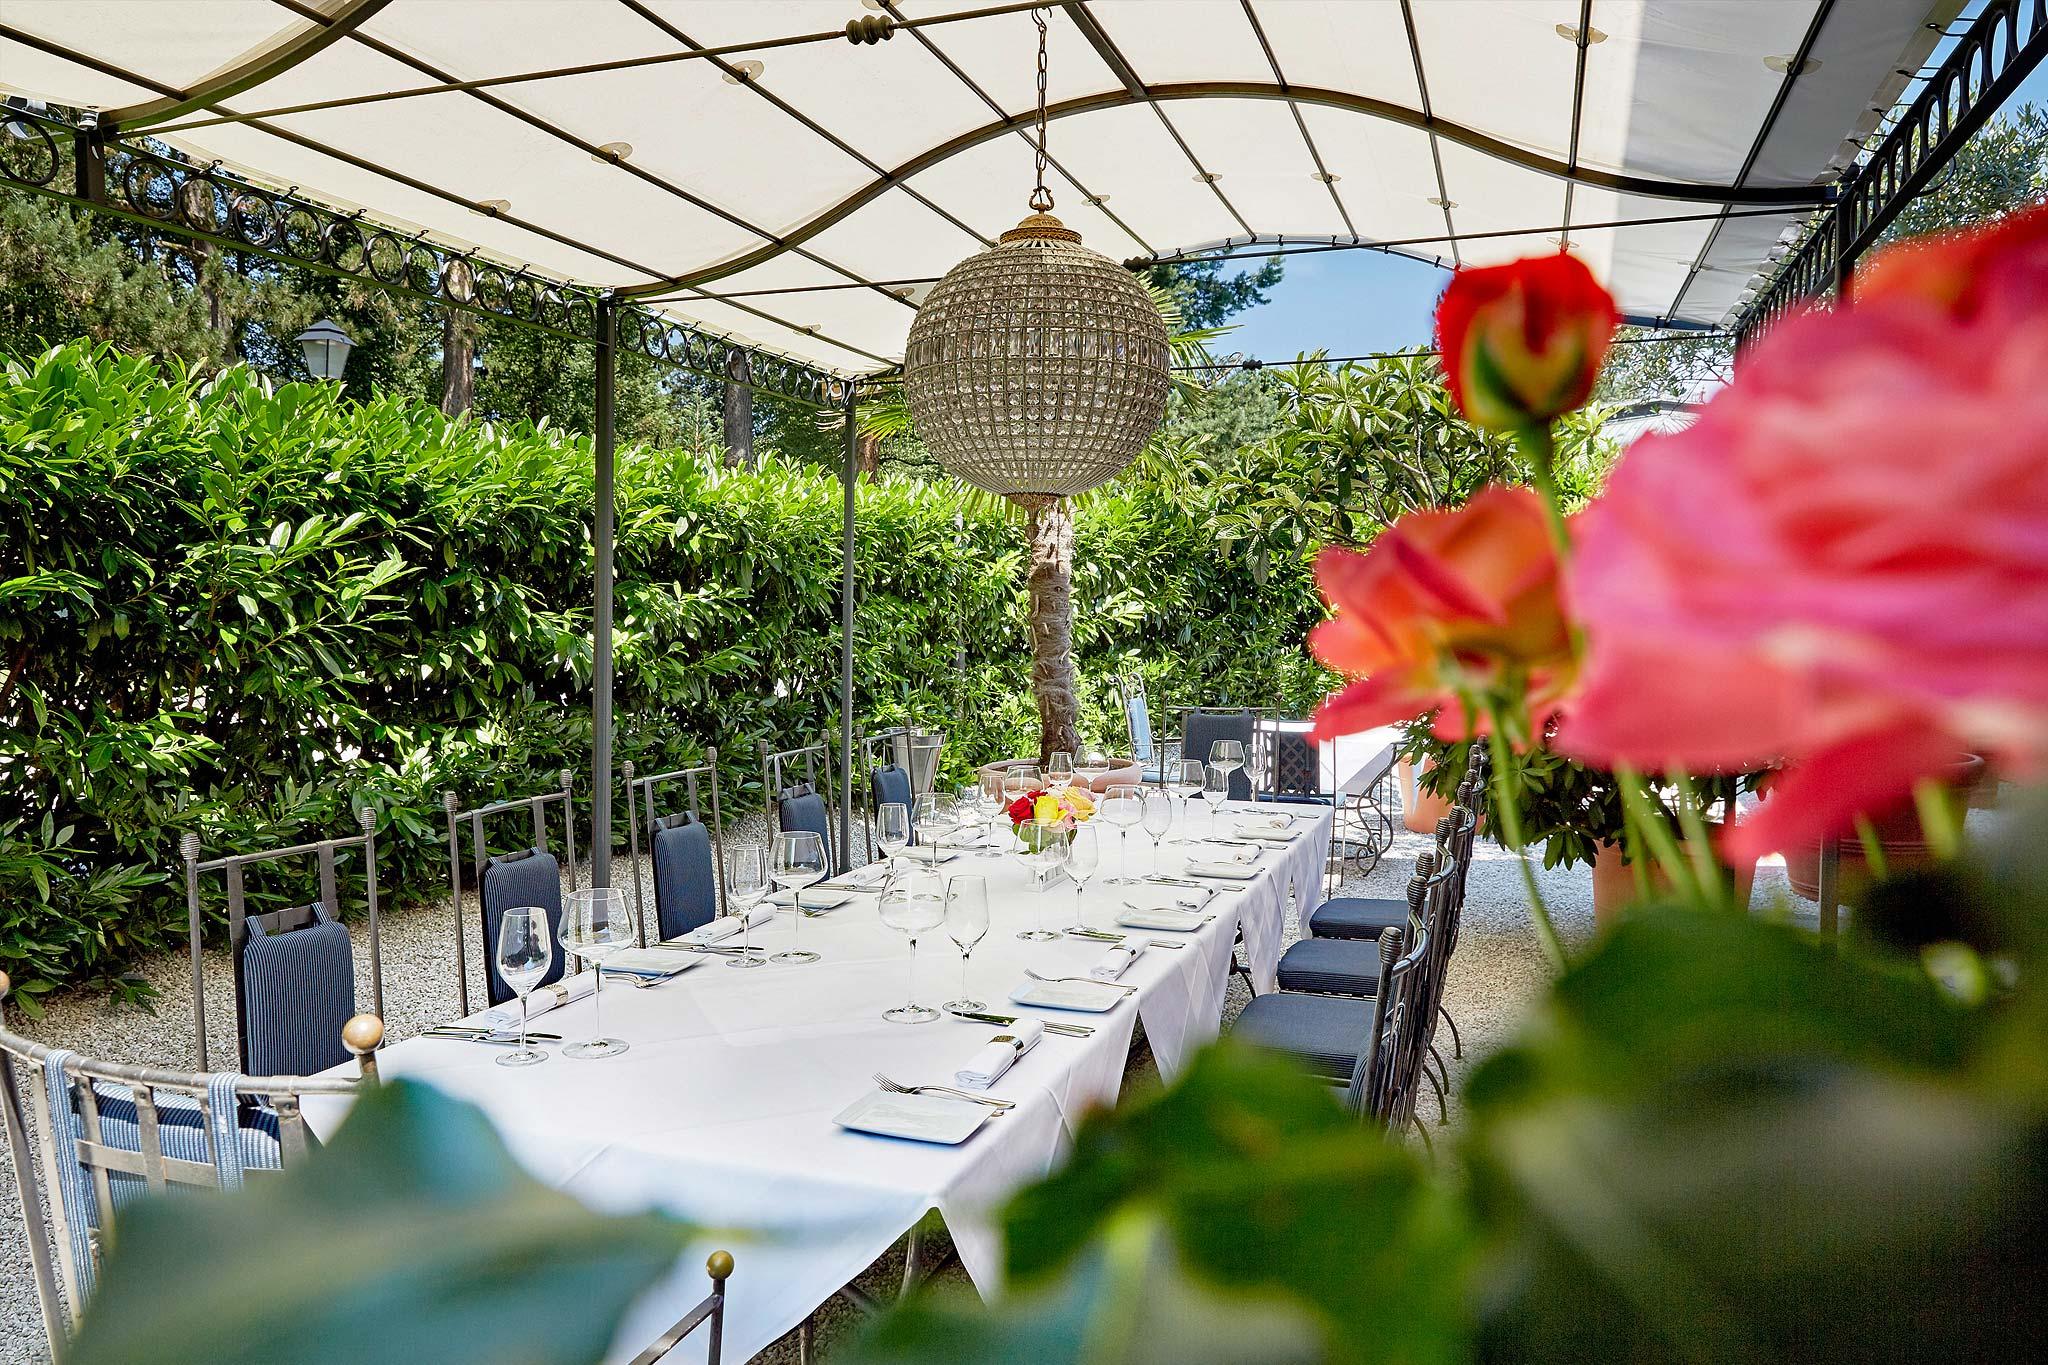 Garten Restaurant Zum Buberlgut Salzburg